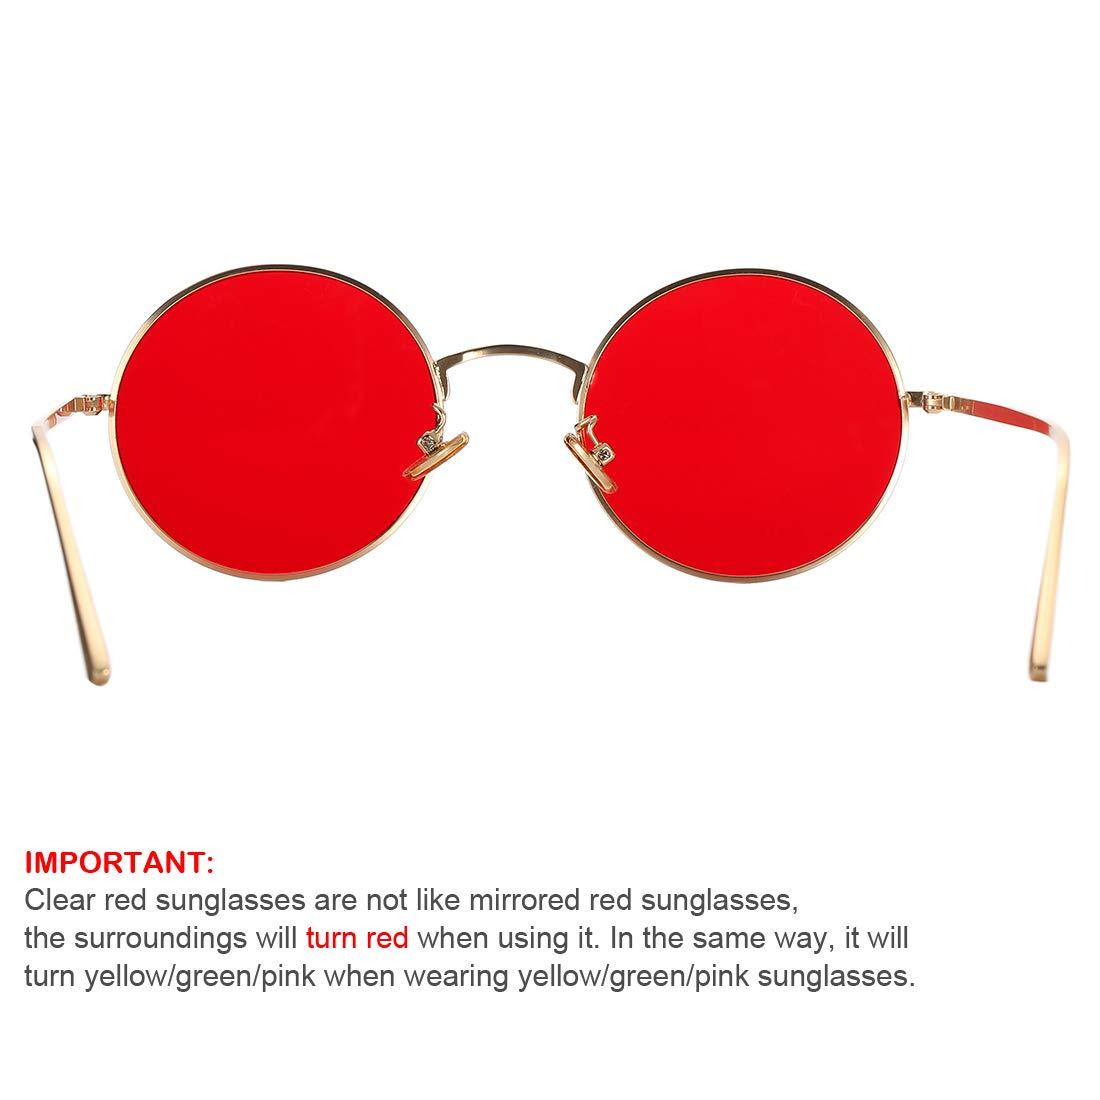 bce18e17208c1 Amazon.com  COASION Vintage Round Metal Sunglasses John Lennon Style Small  Unisex Sun Glasses (Gold Frame Red Lens)  Clothing